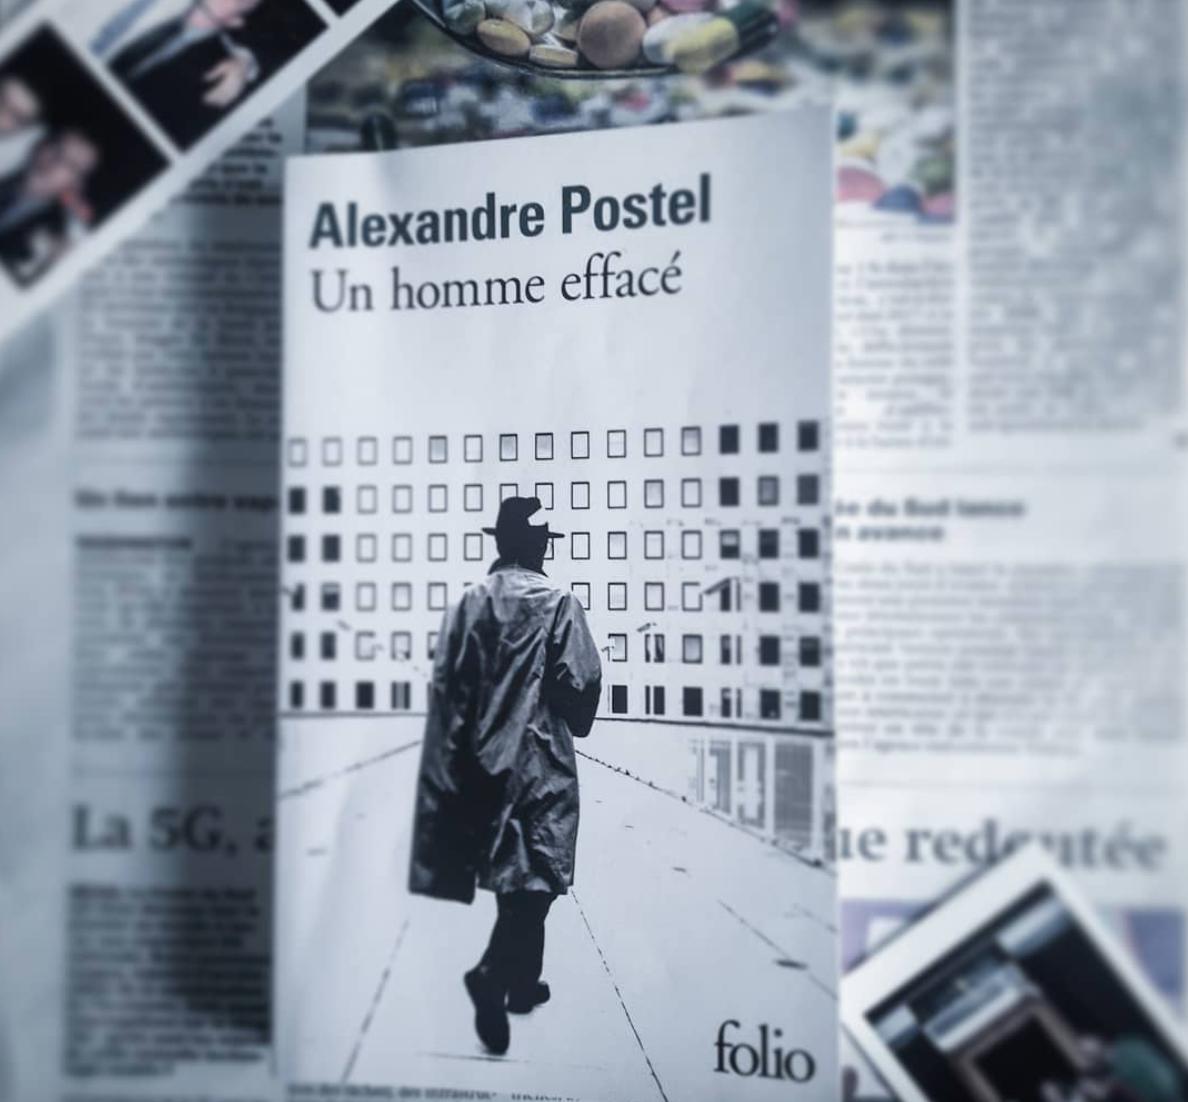 Alexandre Postel, Folio, 2014